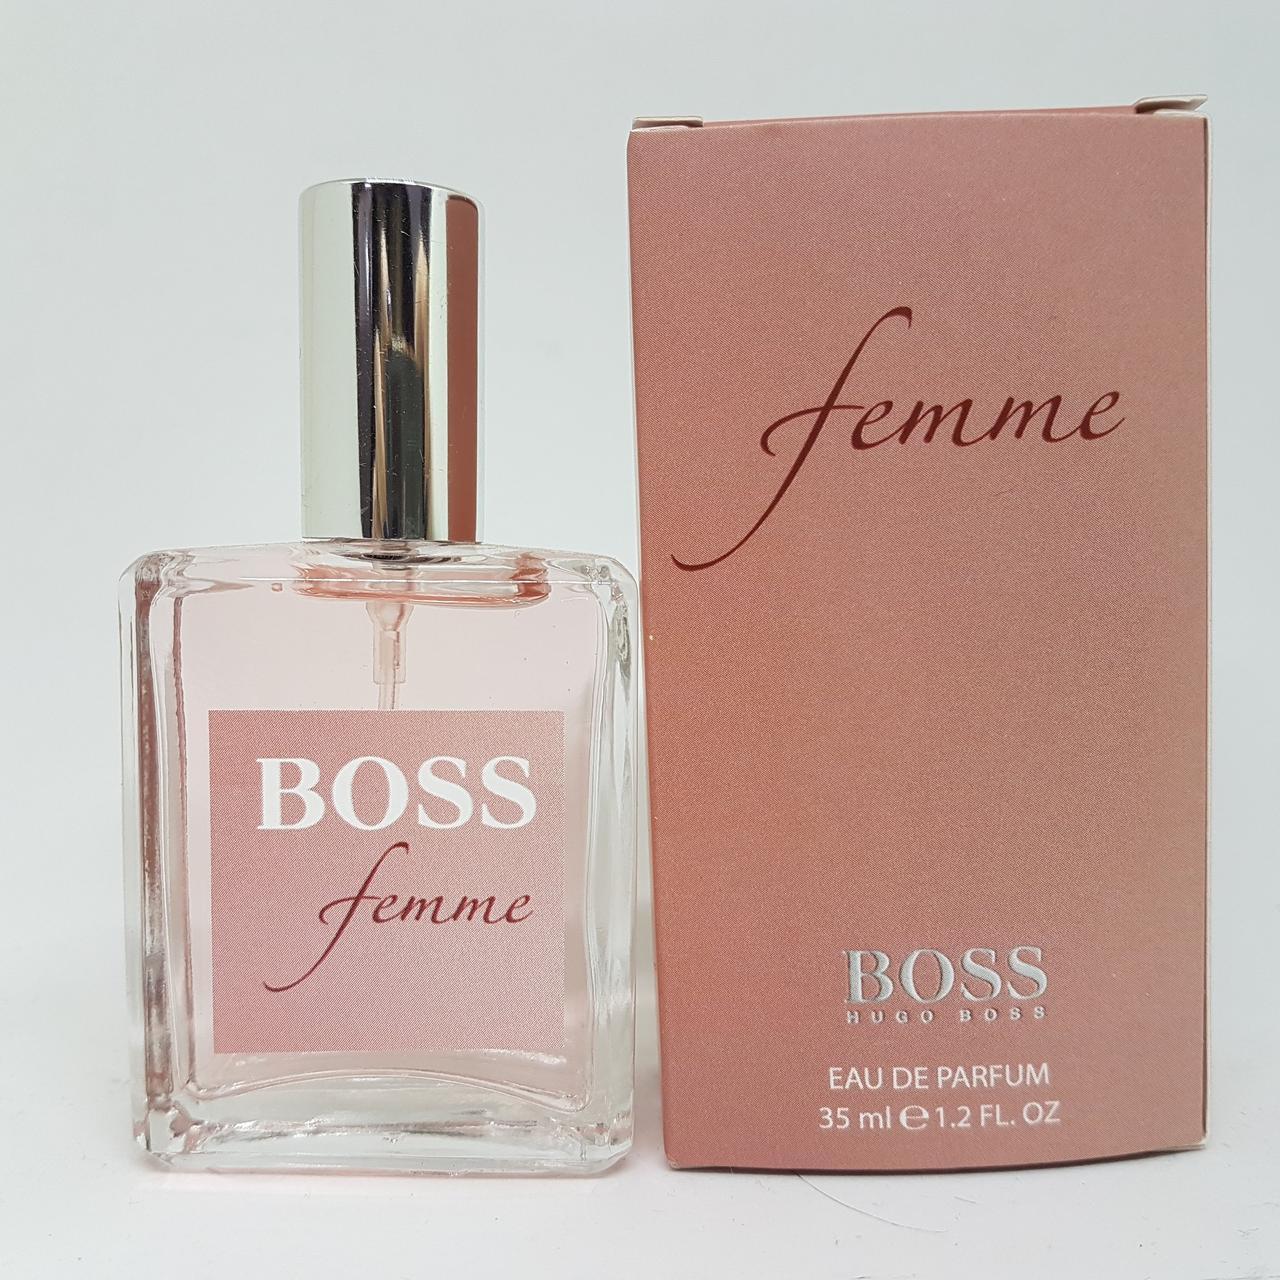 Hugo Boss Boss Femme Voyage 30ml цена 54 грн купить в харькове